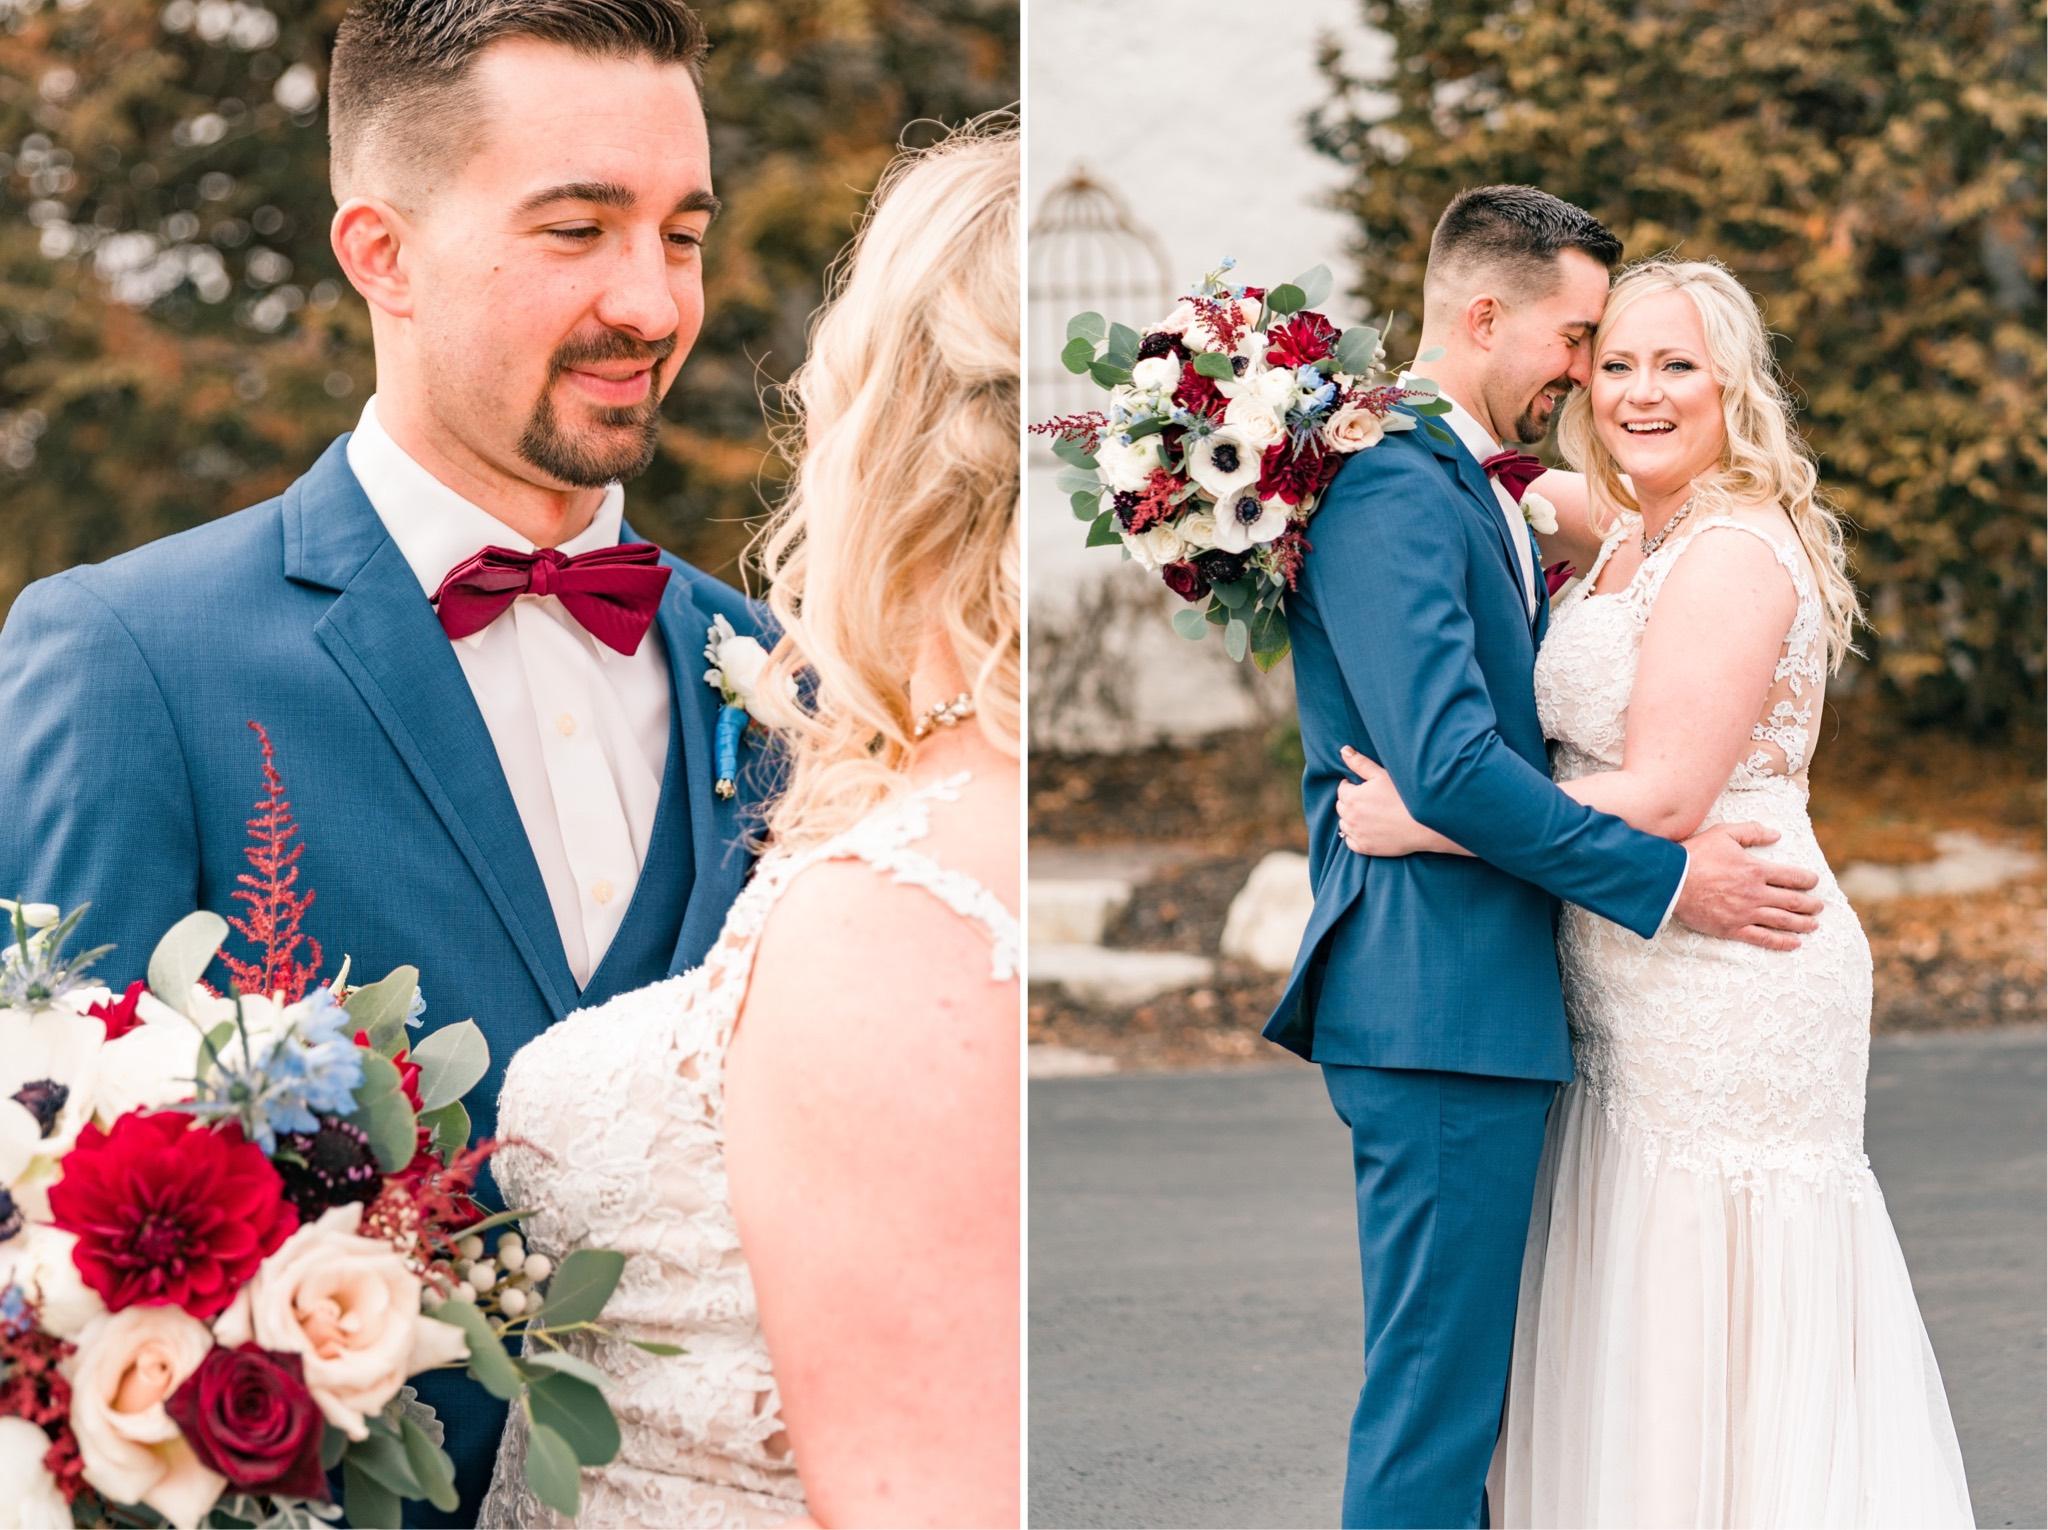 Steve & Casi Winter Wedding at The Barn on Bridge in Collegeville, PA Photos